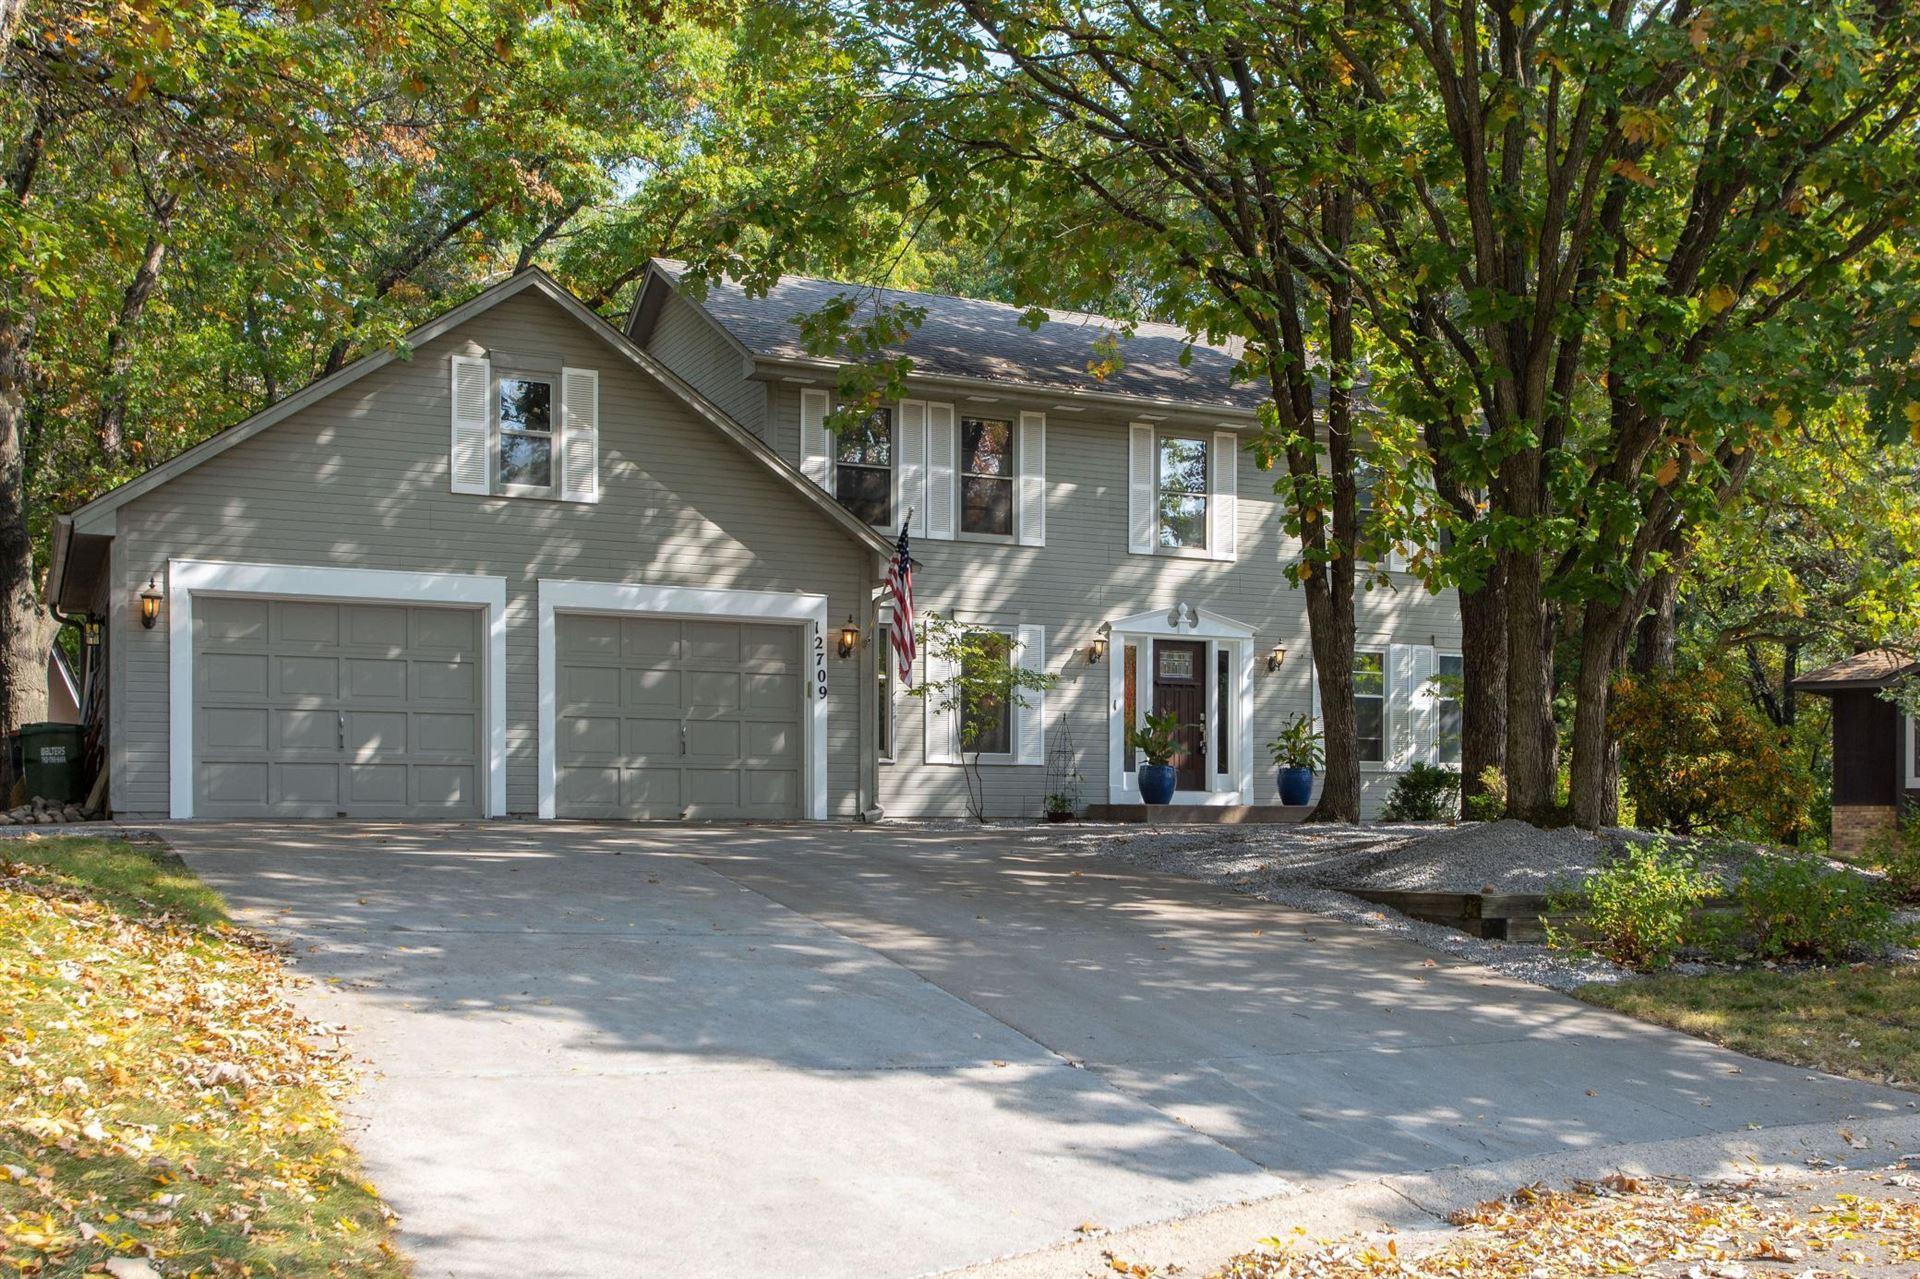 12709 Killdeer Street NW, Coon Rapids, MN 55448 - MLS#: 5665816